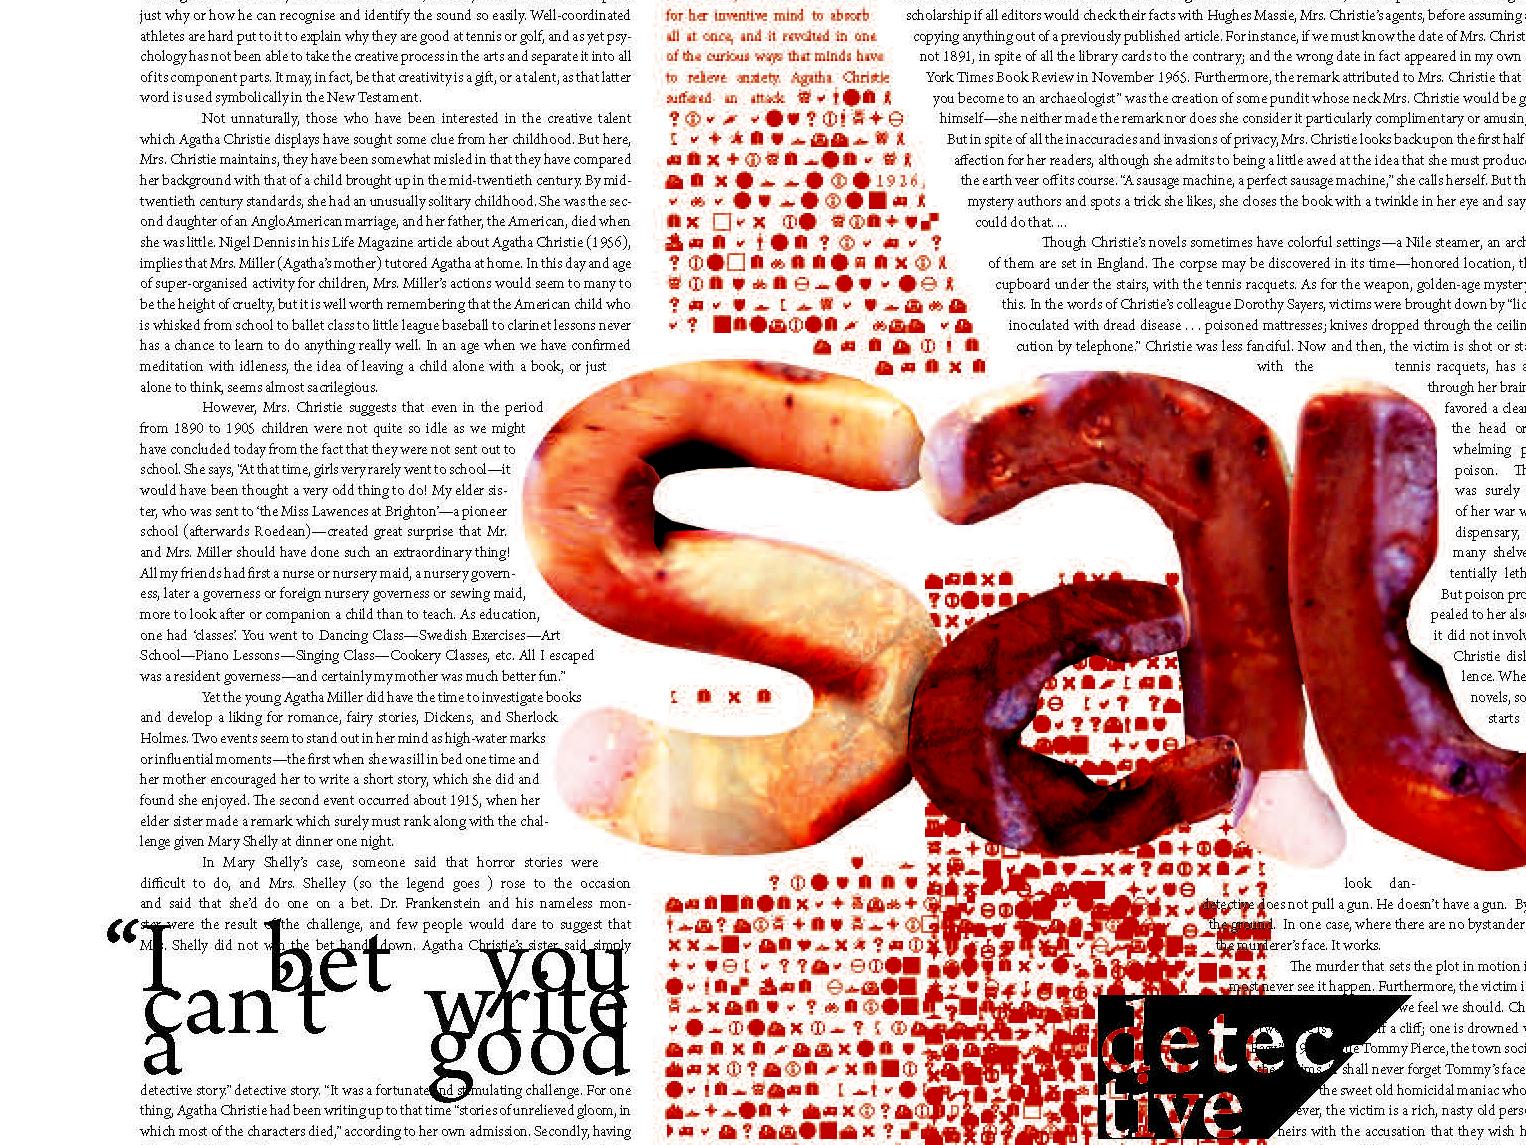 Dingbats visual communication visual design storytelling dingbats indesign bookdesign publishing editorial design layoutdesign typography art direction graphic design